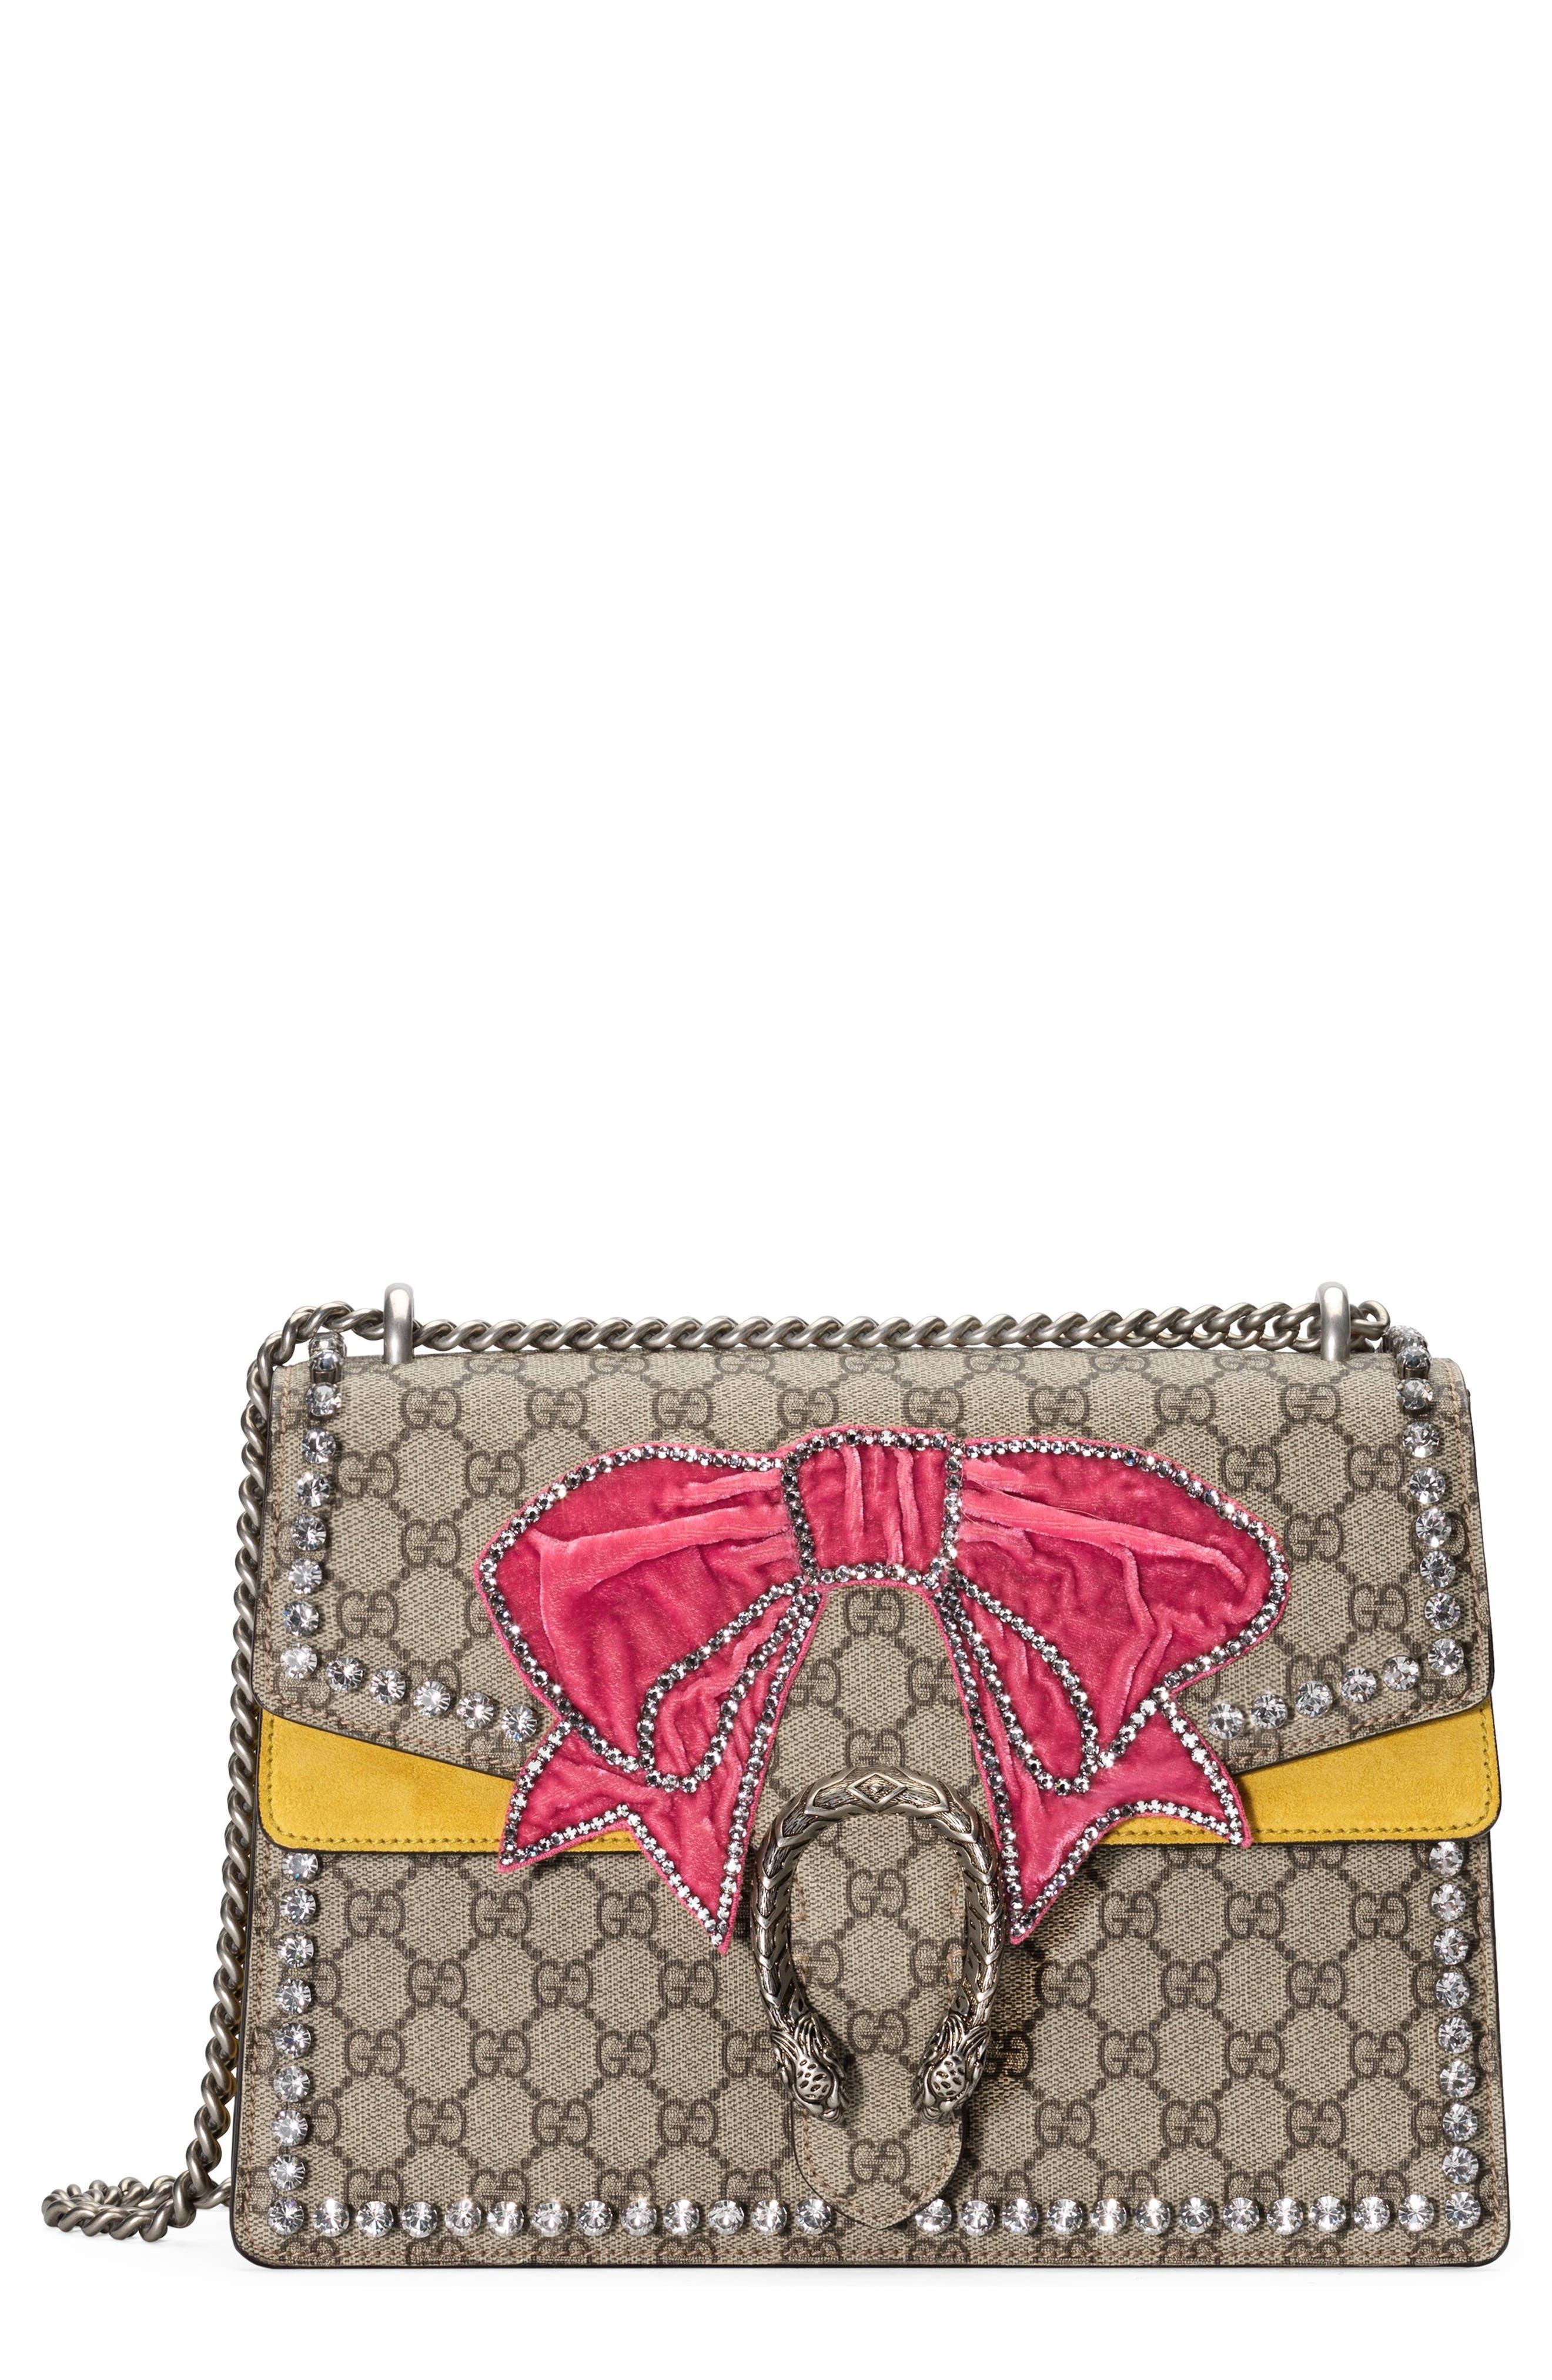 Medium Dionysus GG Supreme Canvas Shoulder Bag,                         Main,                         color, Beige Ebony Crystal